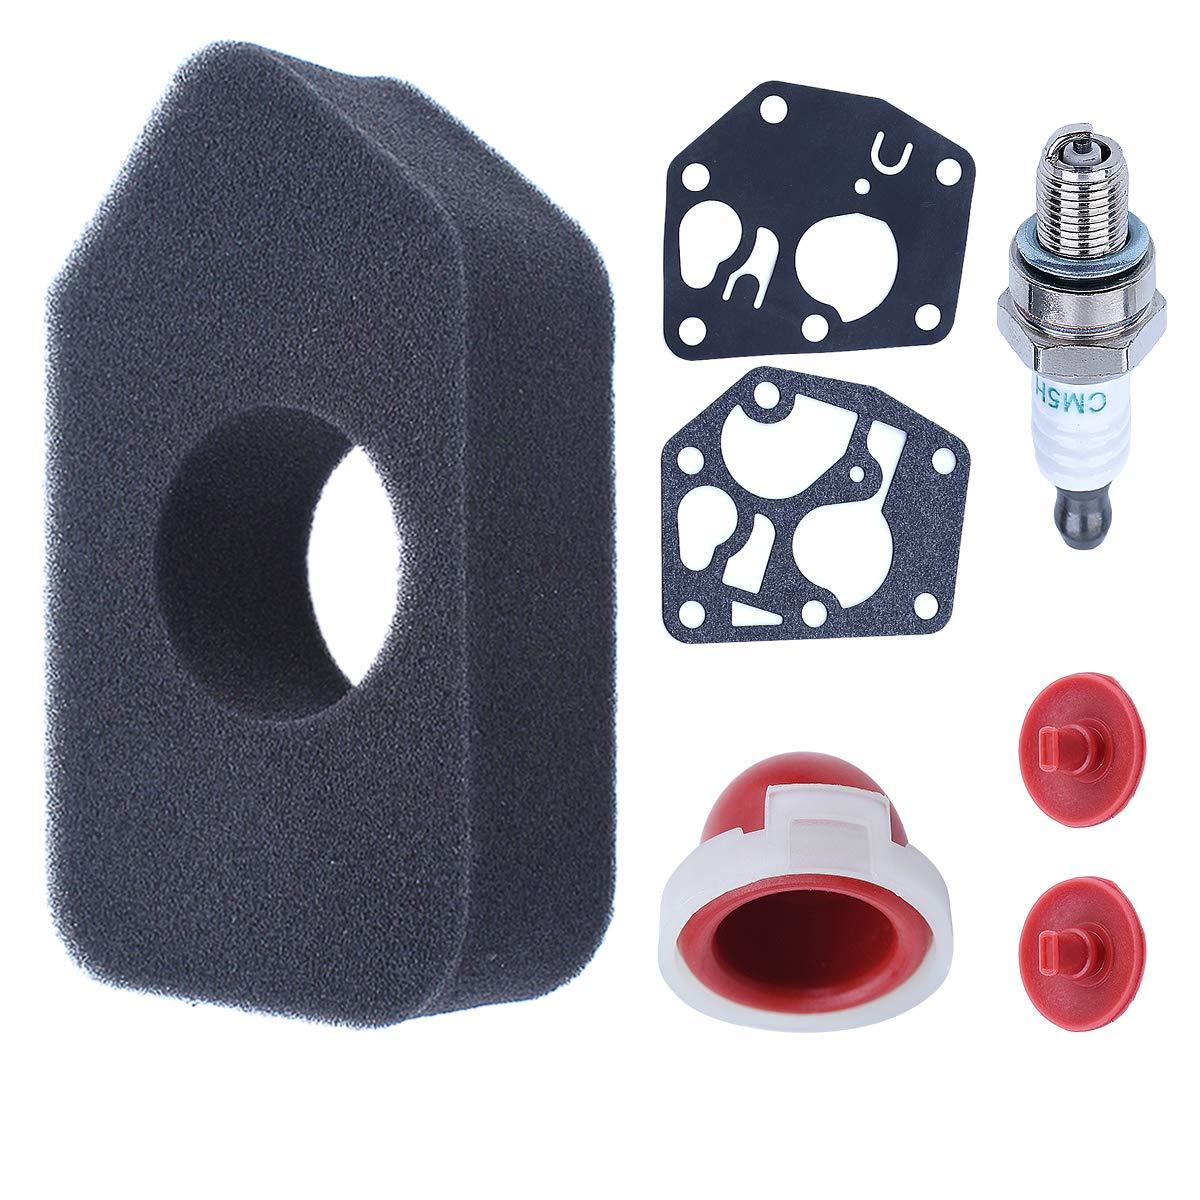 Adefol Air Filter 698369 4216 5086K 5088 with Carburetor Diaphragm Gasket Primer Bulb Spark Plug for Briggs & Stratton 3.5-4.5 HP Classic Sprint Quattro Engine